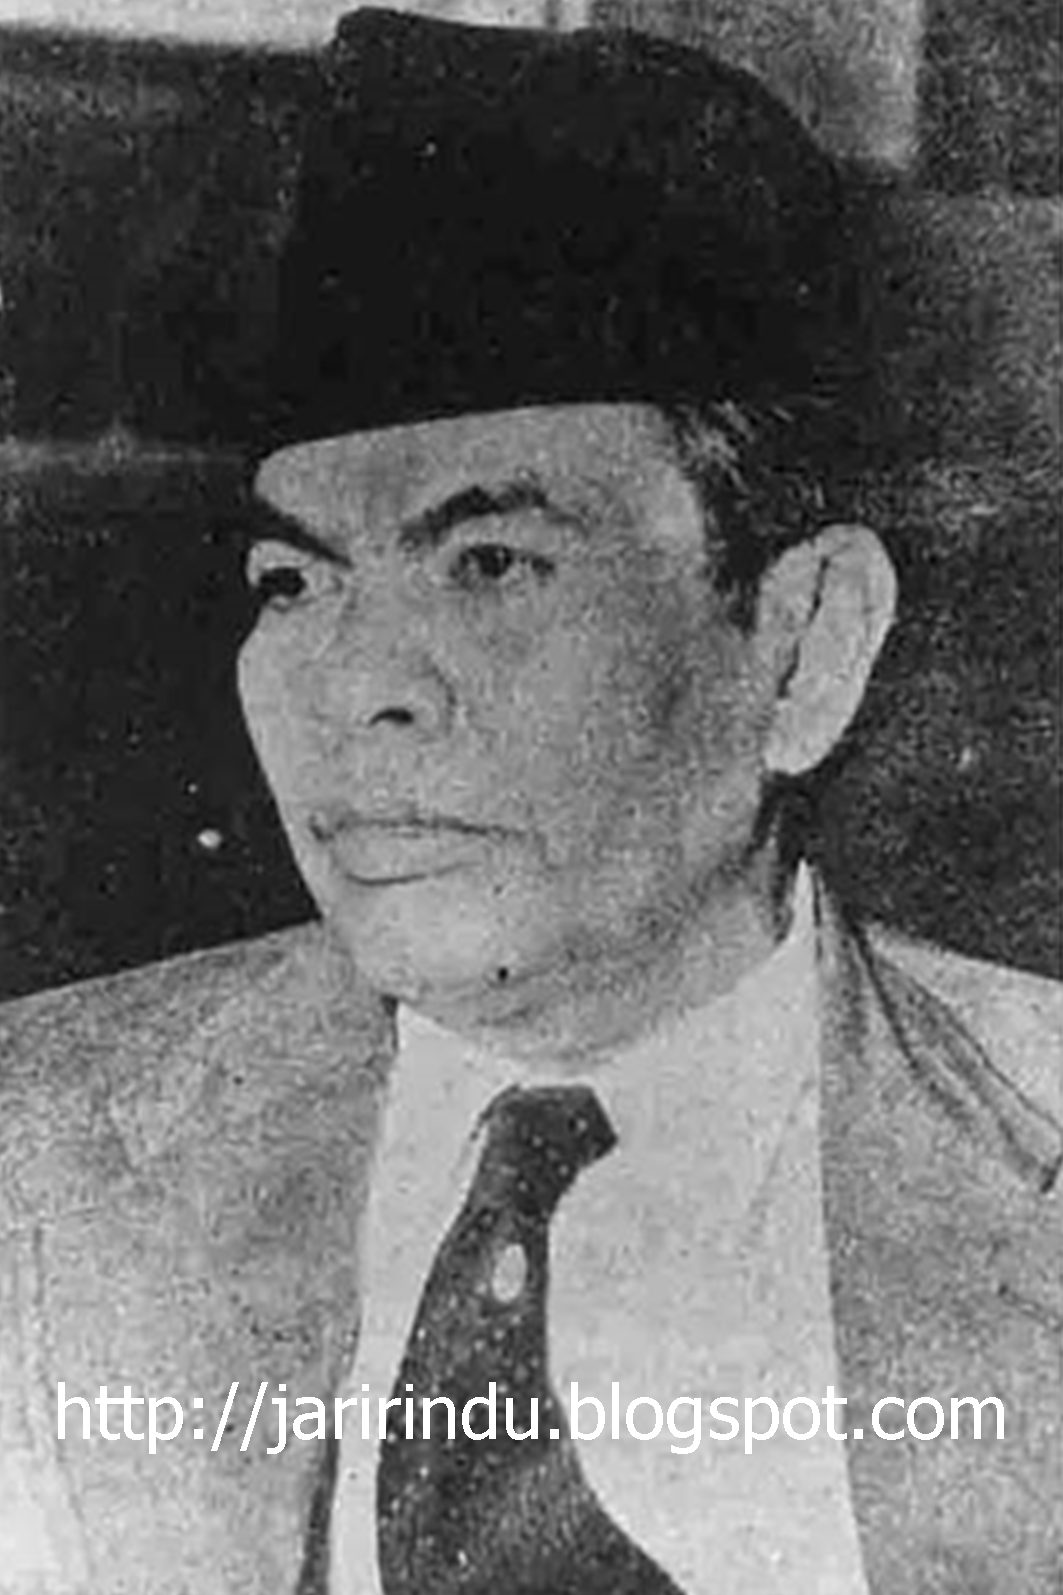 Gambar Mohamad Yamin Kongres Sumpah Pemuda Tokoh Biografi Muhammad Yamin Jari Rindu Blog